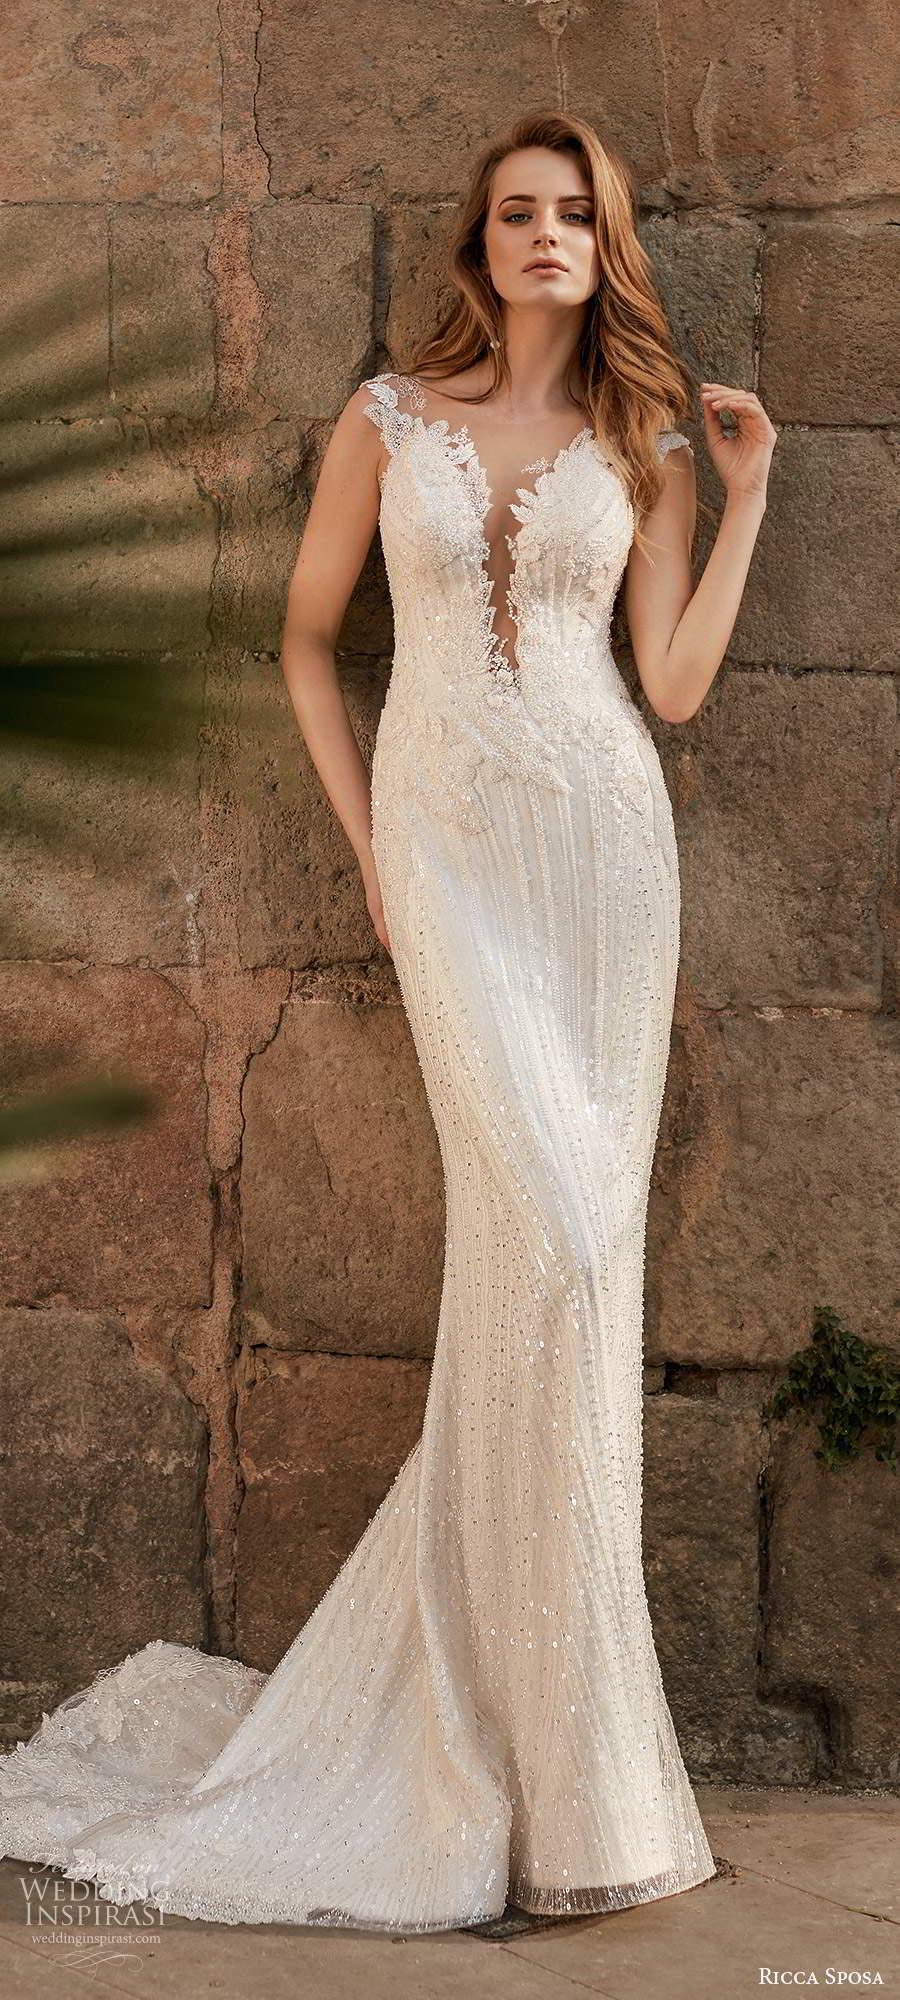 ricca sposa 2020 barcelona bridal illusion cap sleeves plunging v neckline fully embellished glitzy sheath wedding dress sheer back chapel train (25) mv